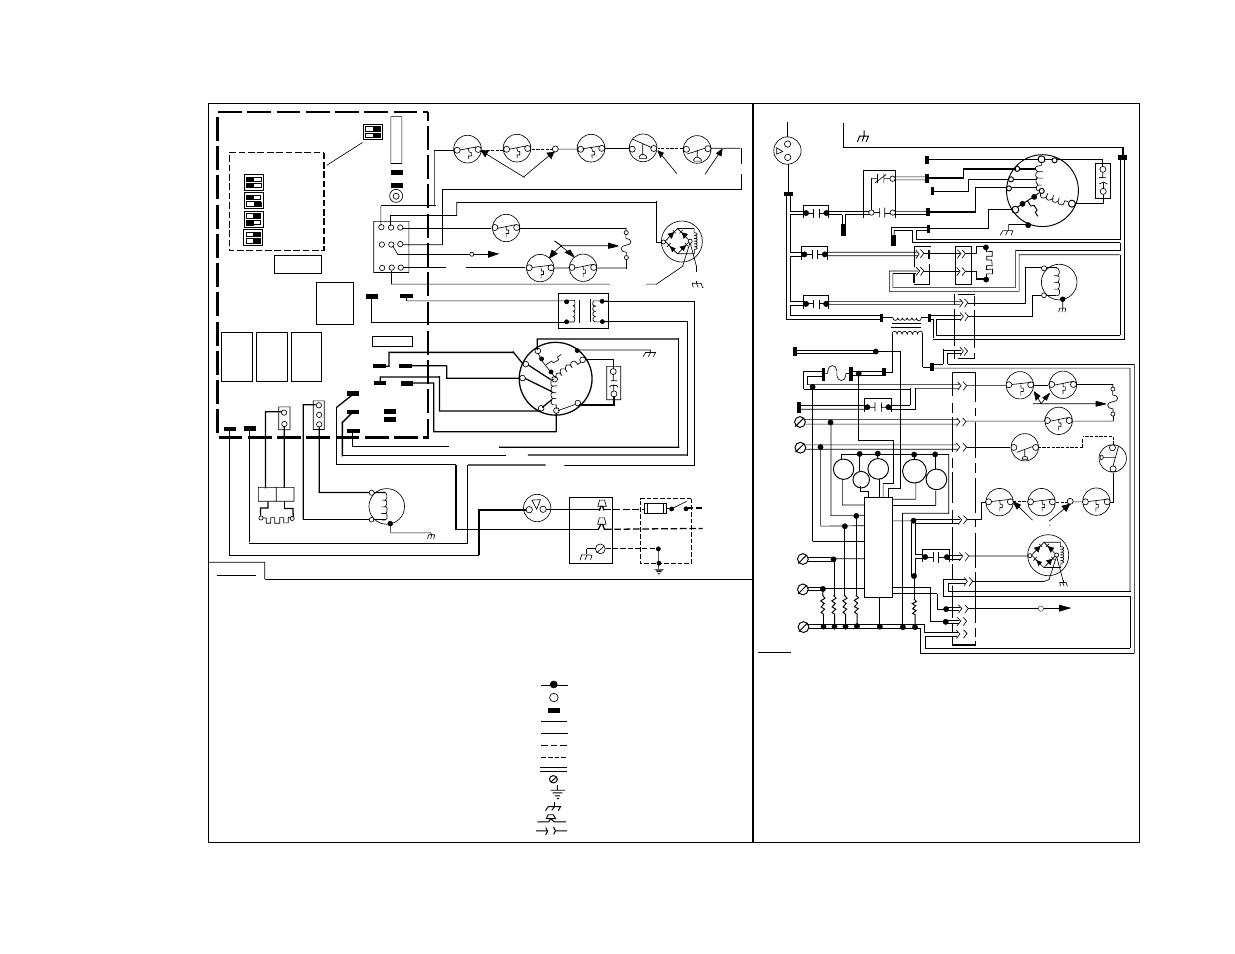 Bryant 80 Wiring Diagram Auto Electrical Cdx Fw700